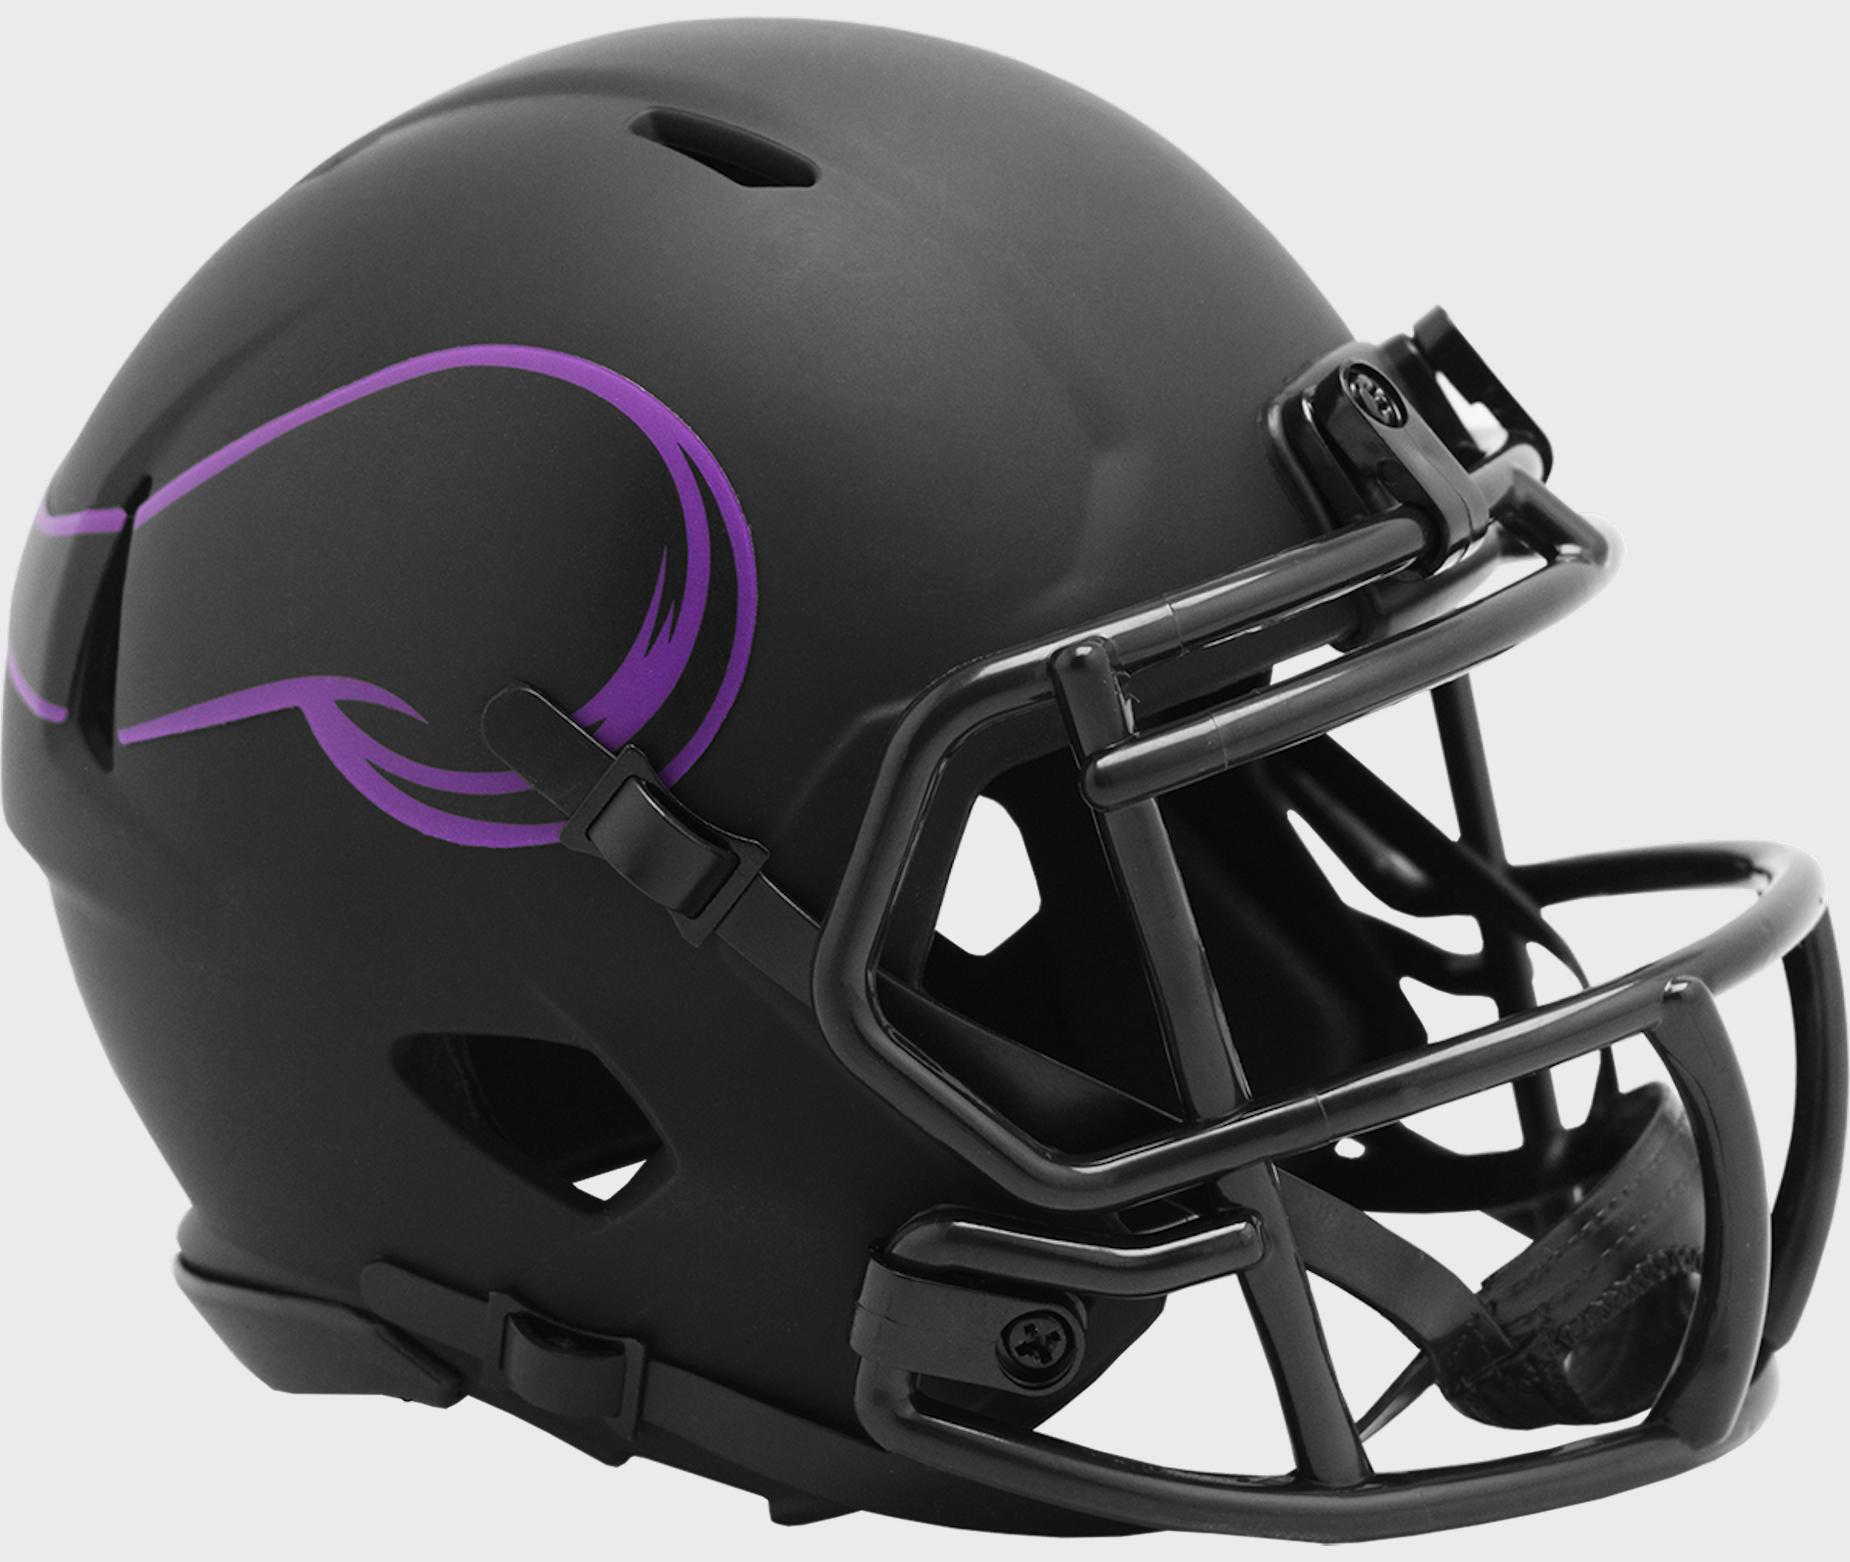 Minnesota Vikings NFL Mini Speed Football Helmet <B>ECLIPSE</B>